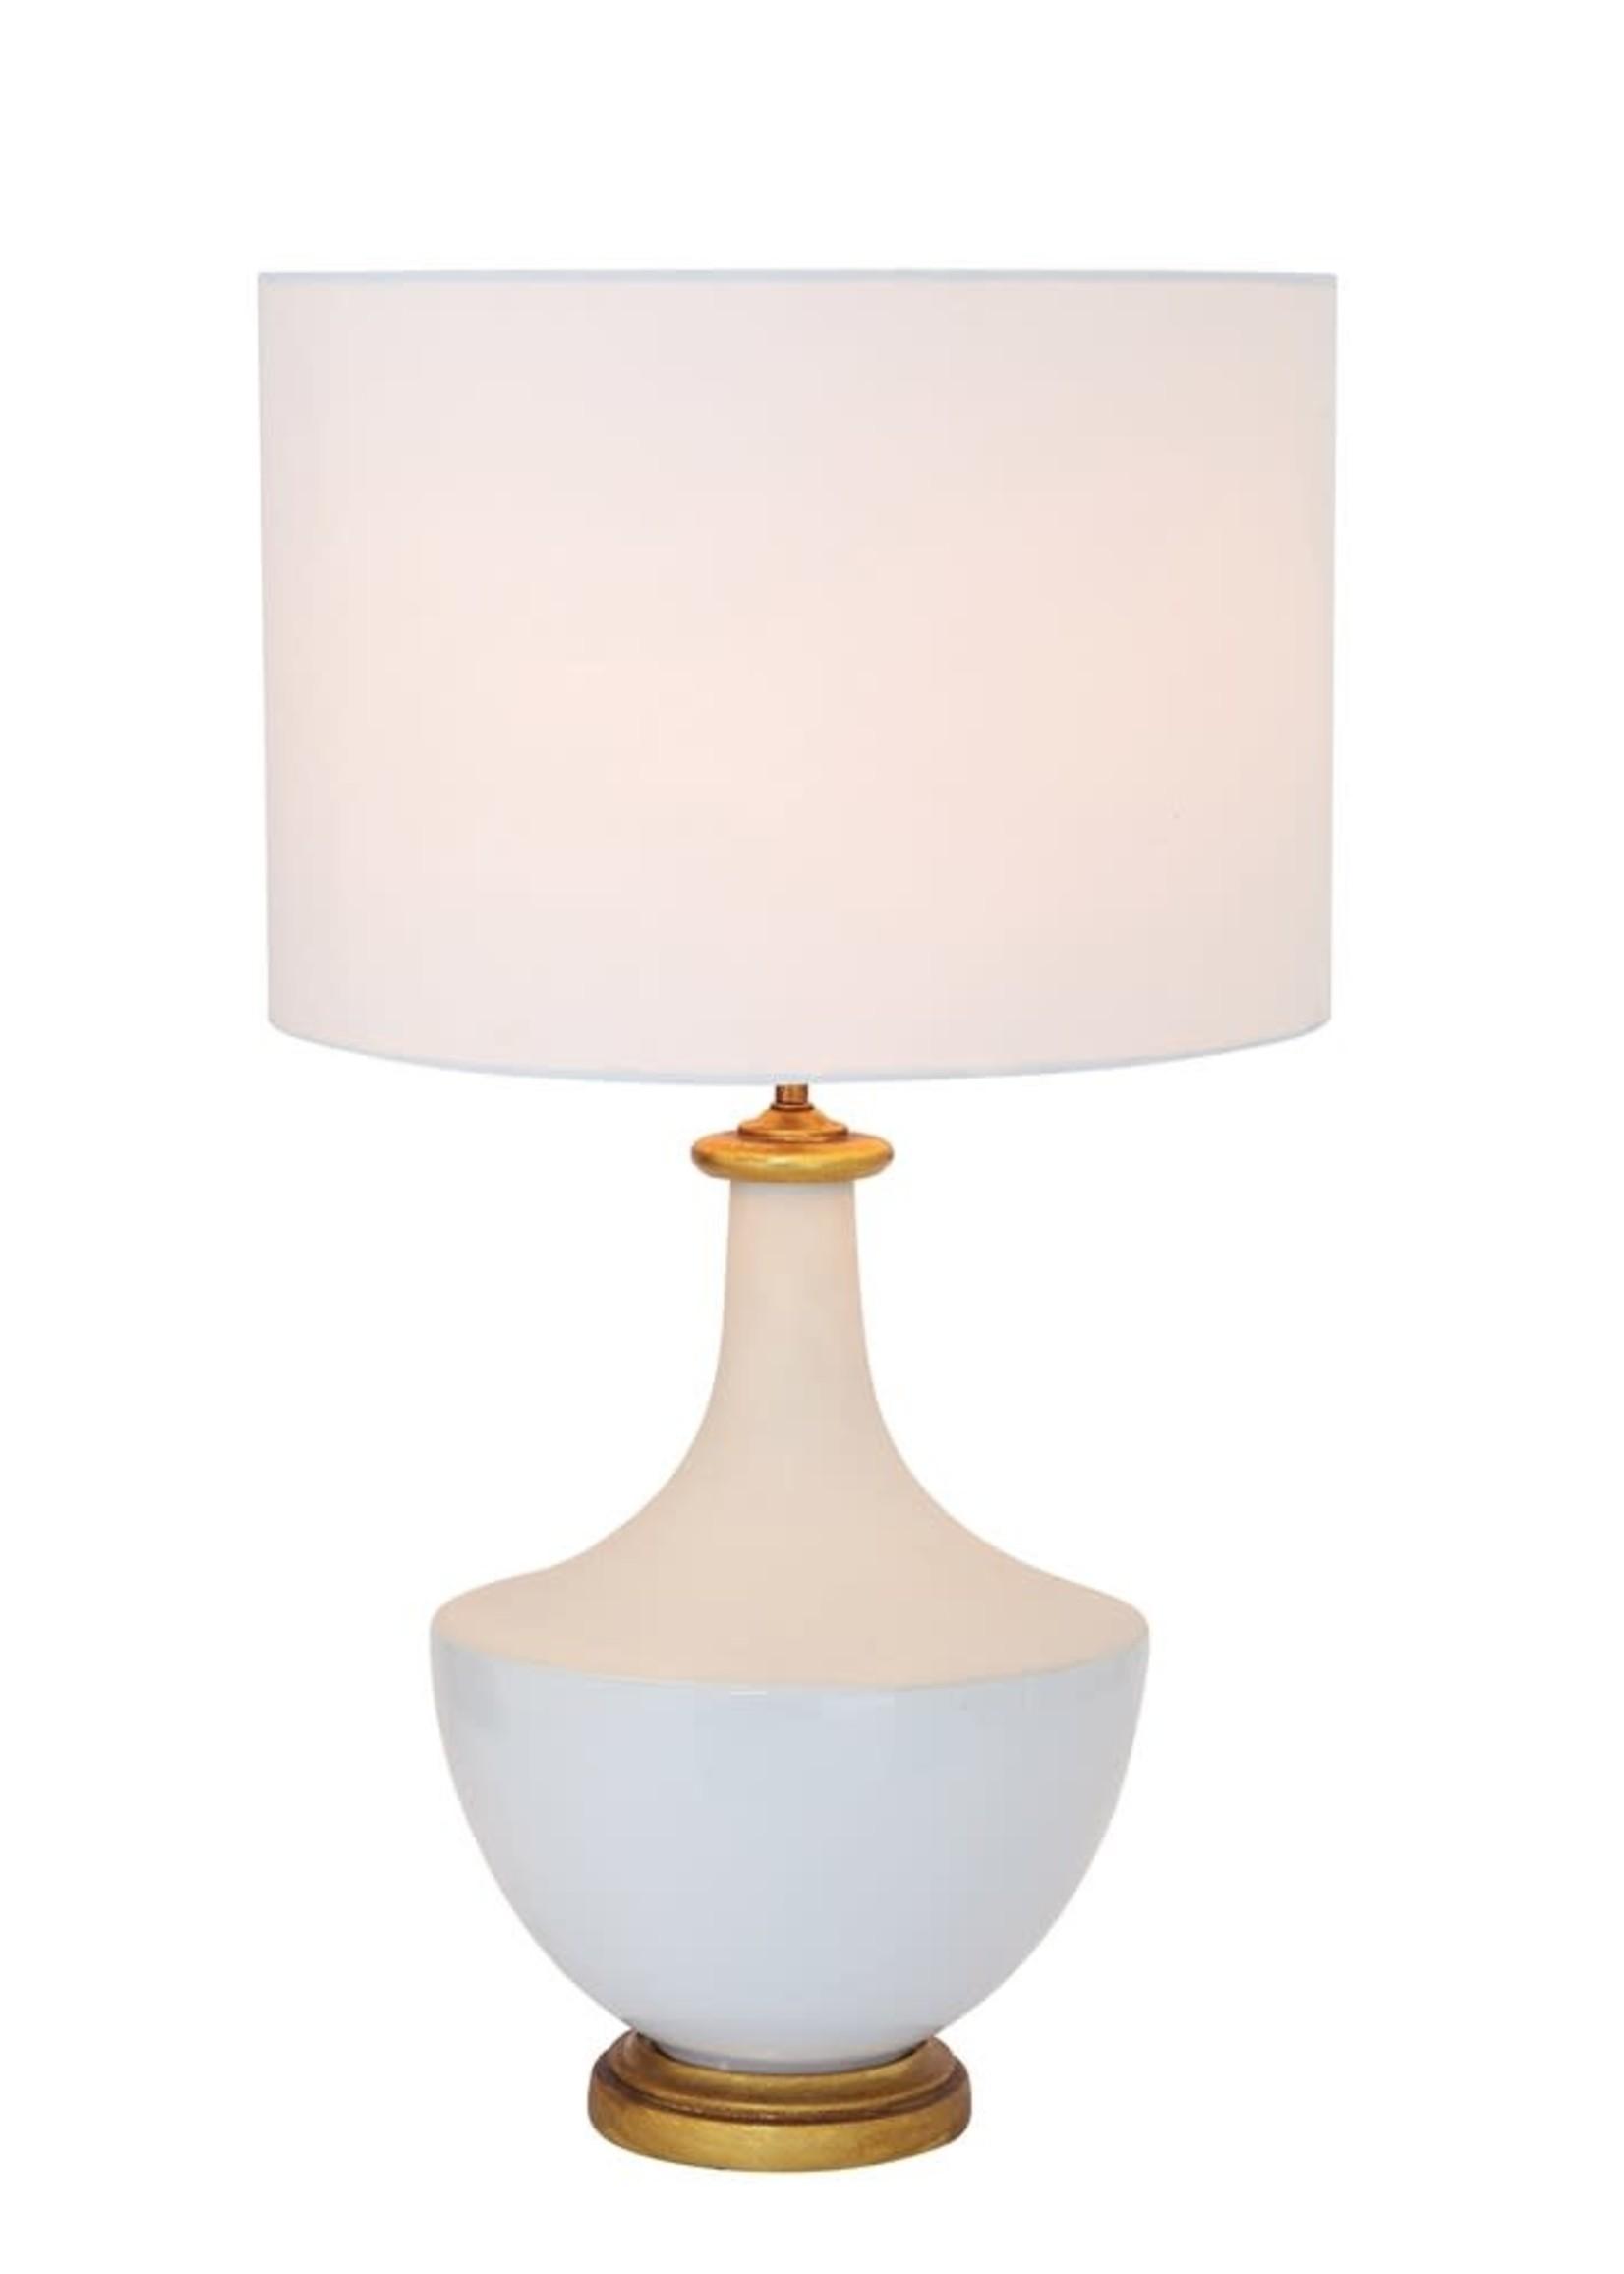 "Creative Co-Op 16"" dia x 27"" H Ceramic Table Lamp w/ Linen Shade - Cream"